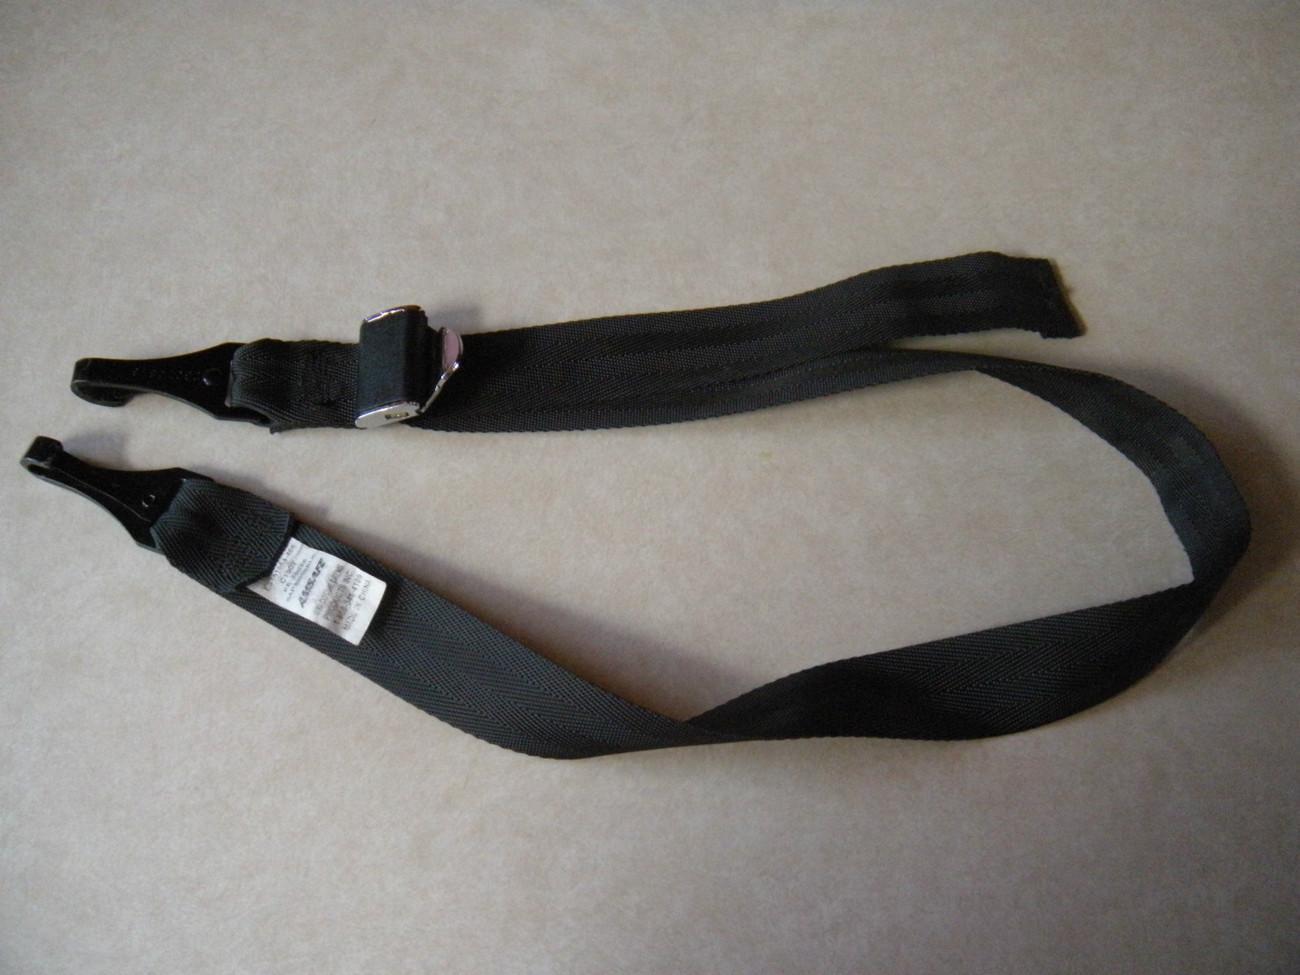 2 graco replacement latch strap belt fits britax roundabout marathon car seat car seat accessories. Black Bedroom Furniture Sets. Home Design Ideas